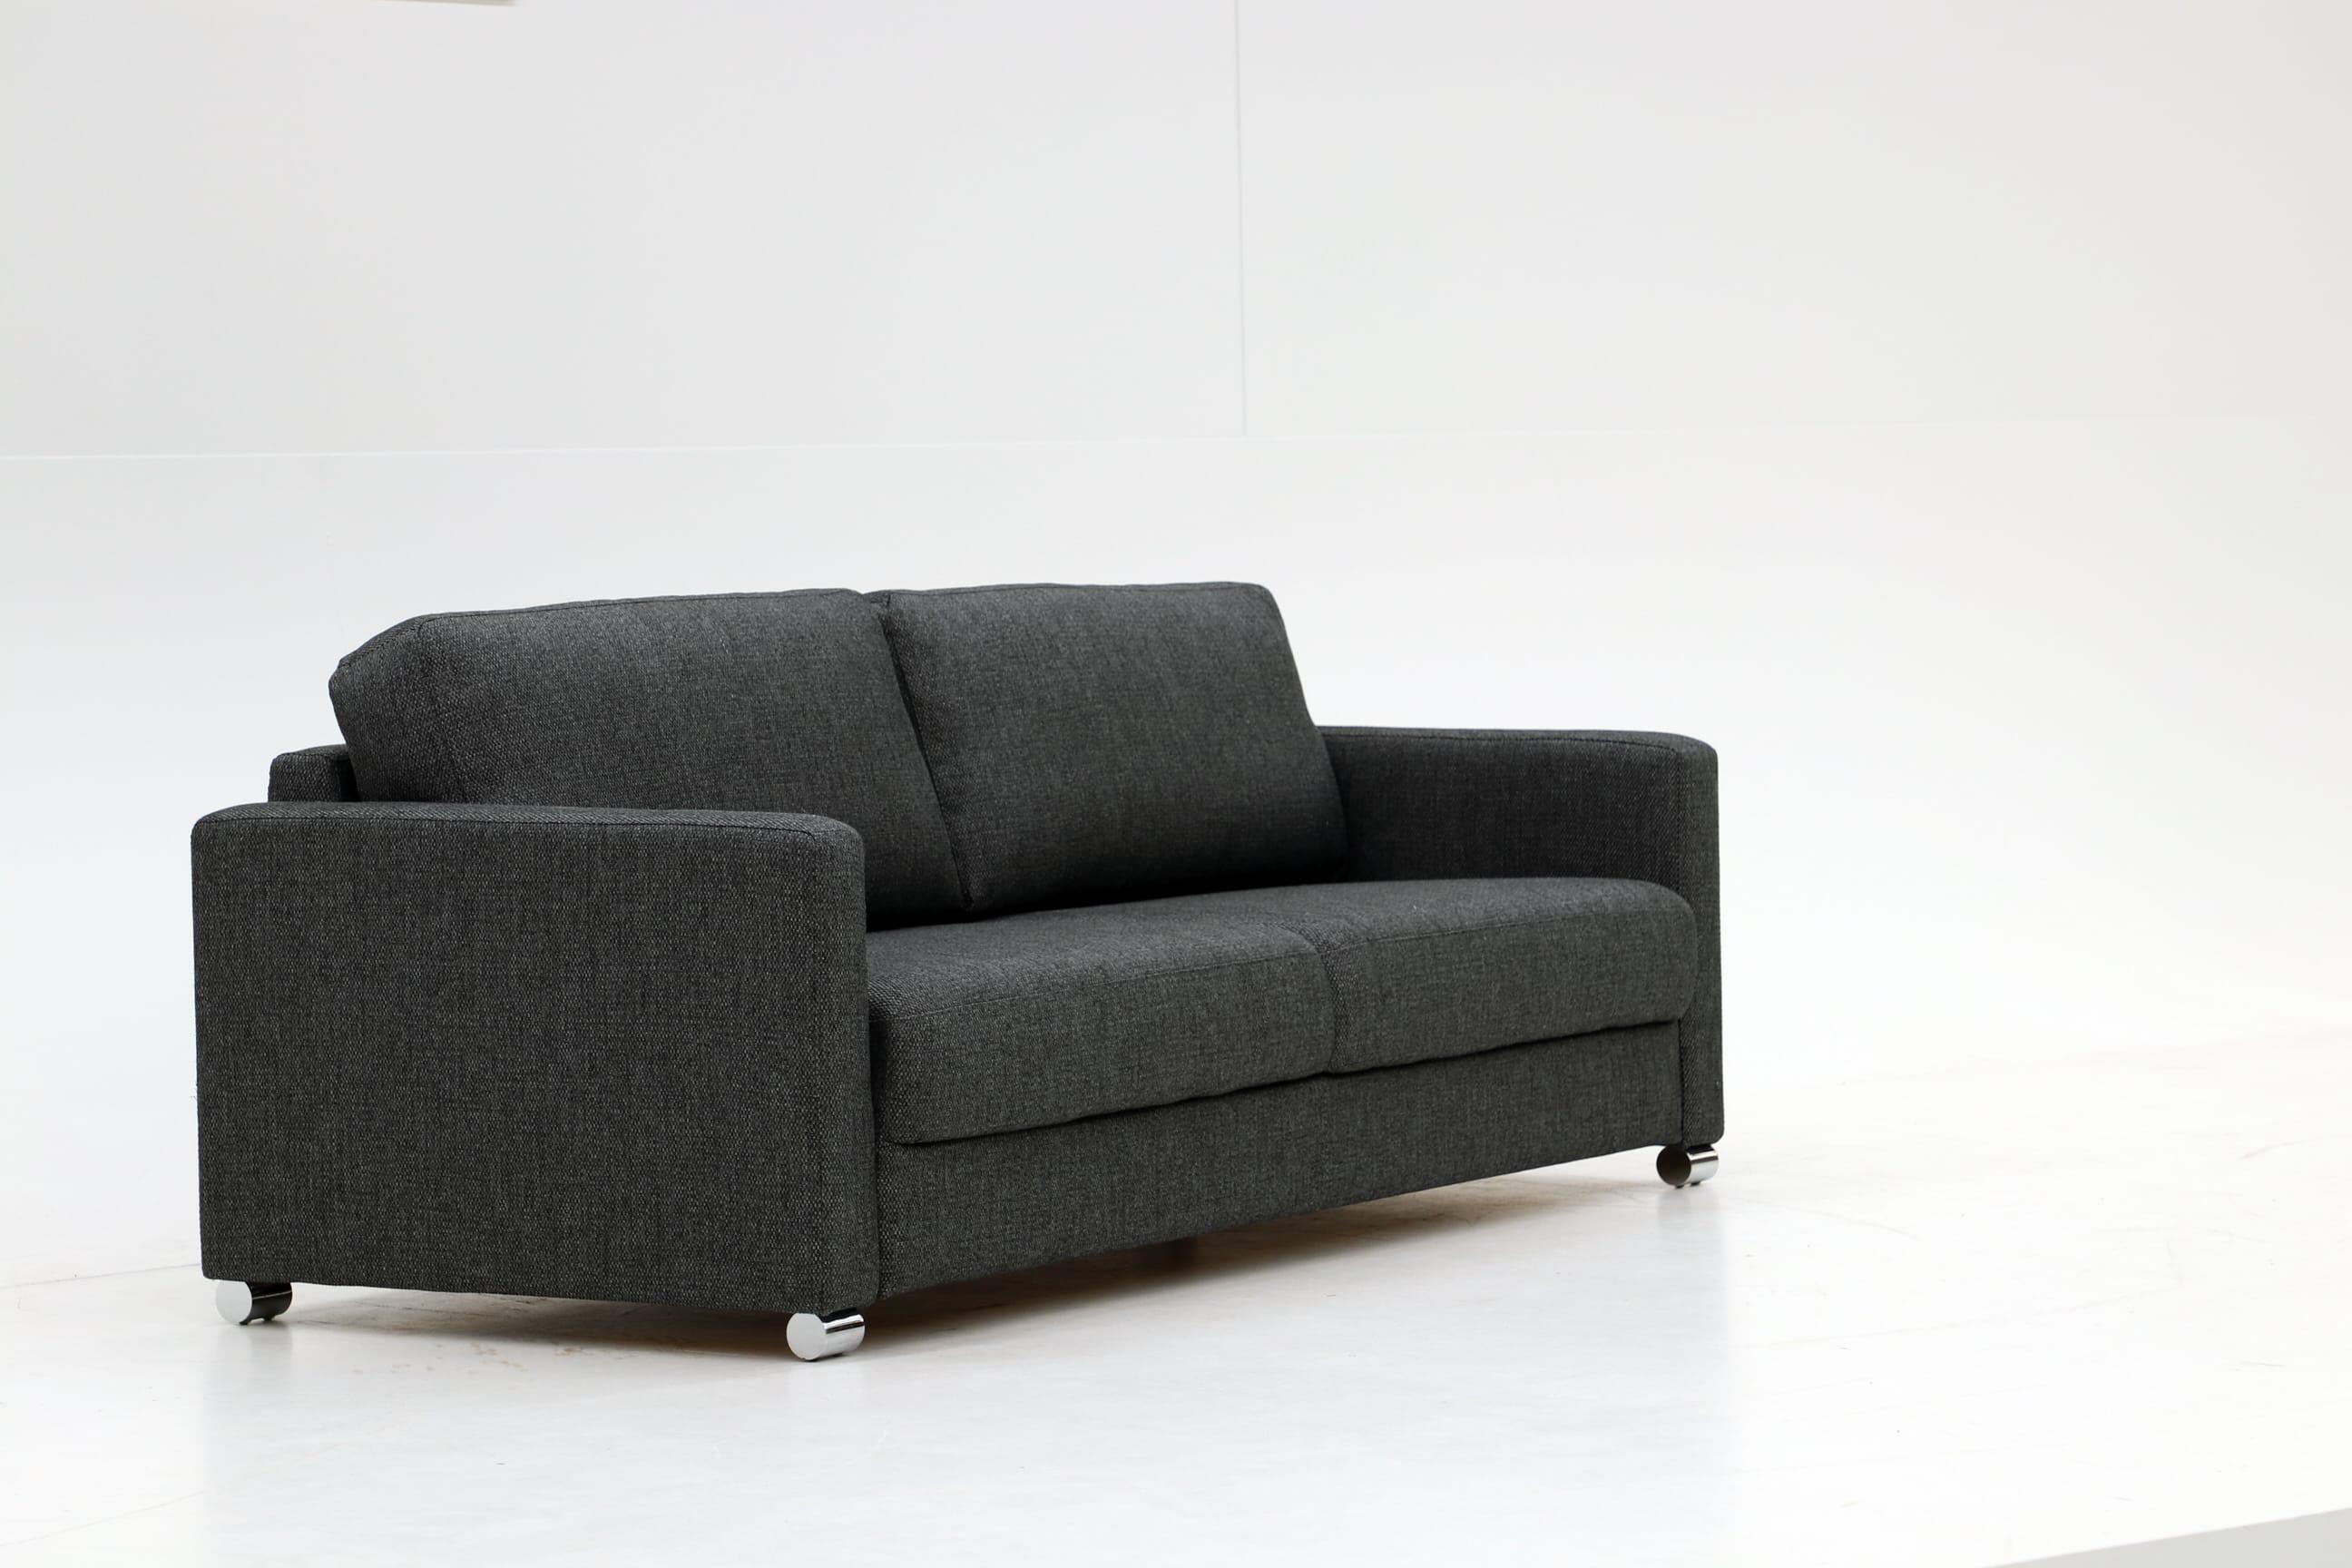 Fantastic Fantasy Sofa Sleeper Full Xl Size By Luonto Furniture Spiritservingveterans Wood Chair Design Ideas Spiritservingveteransorg